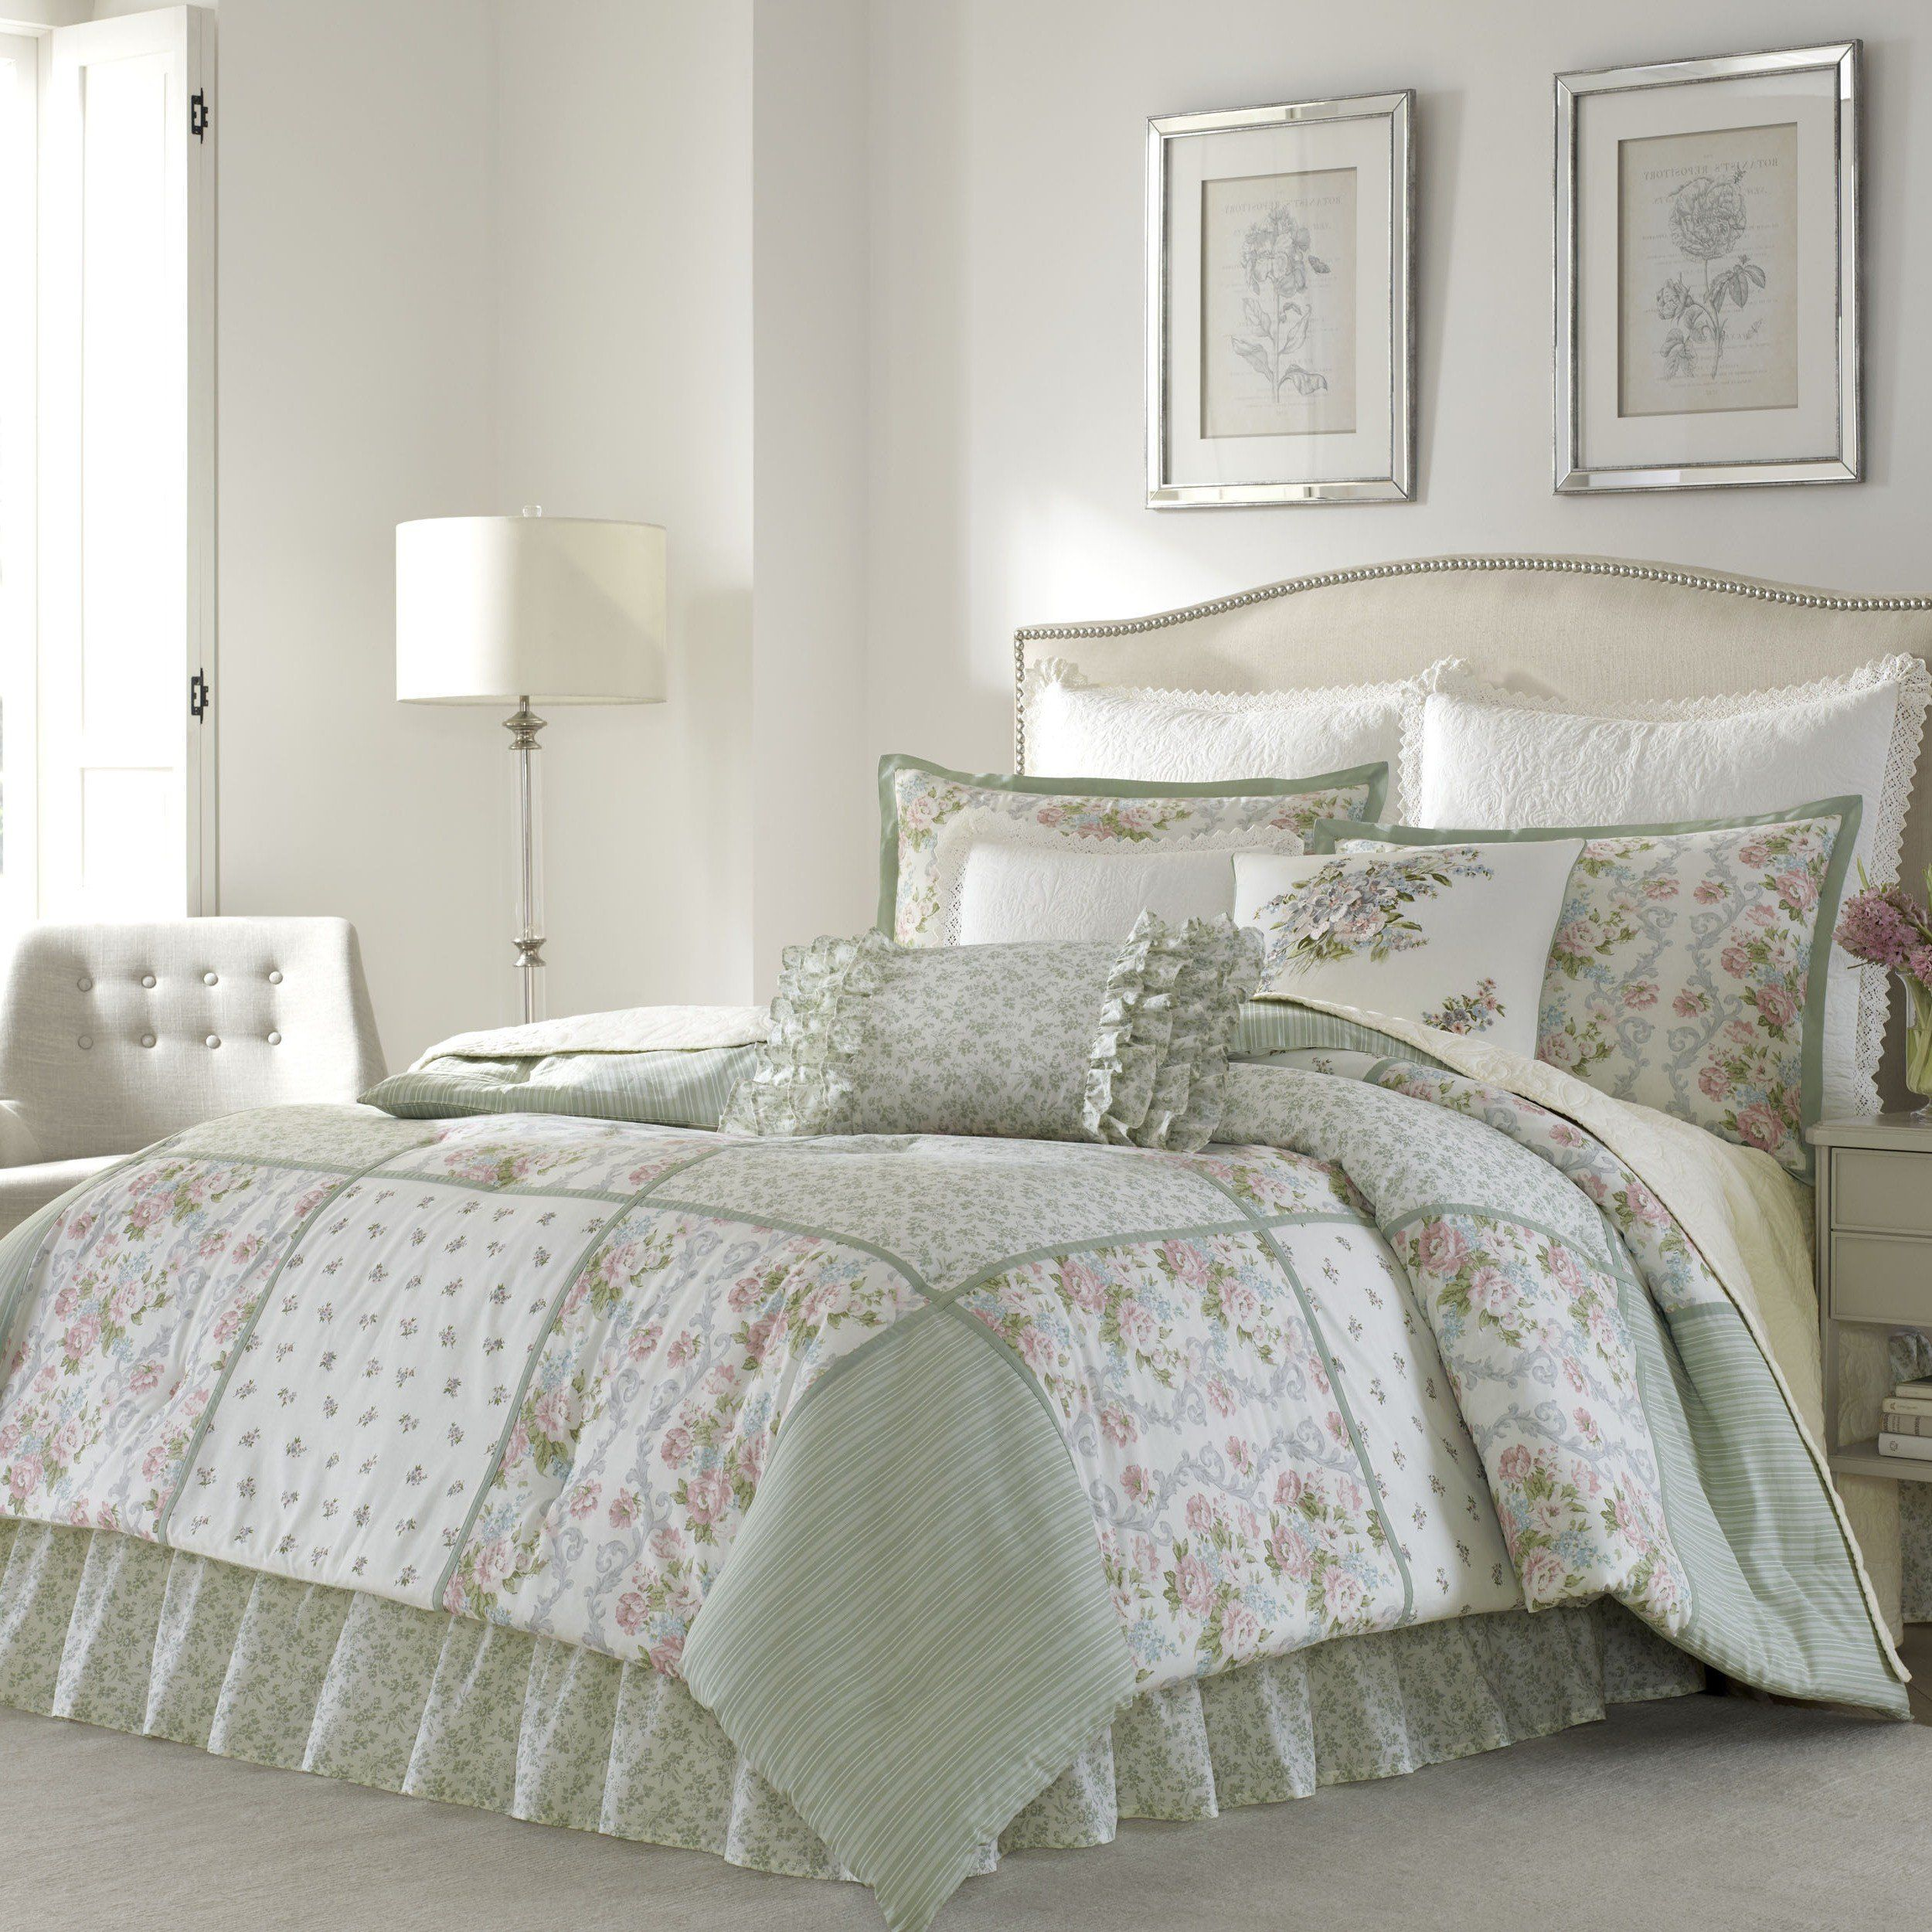 Best 4 Piece Queen Floral Comforter Set Allover Adorable Flower 640 x 480